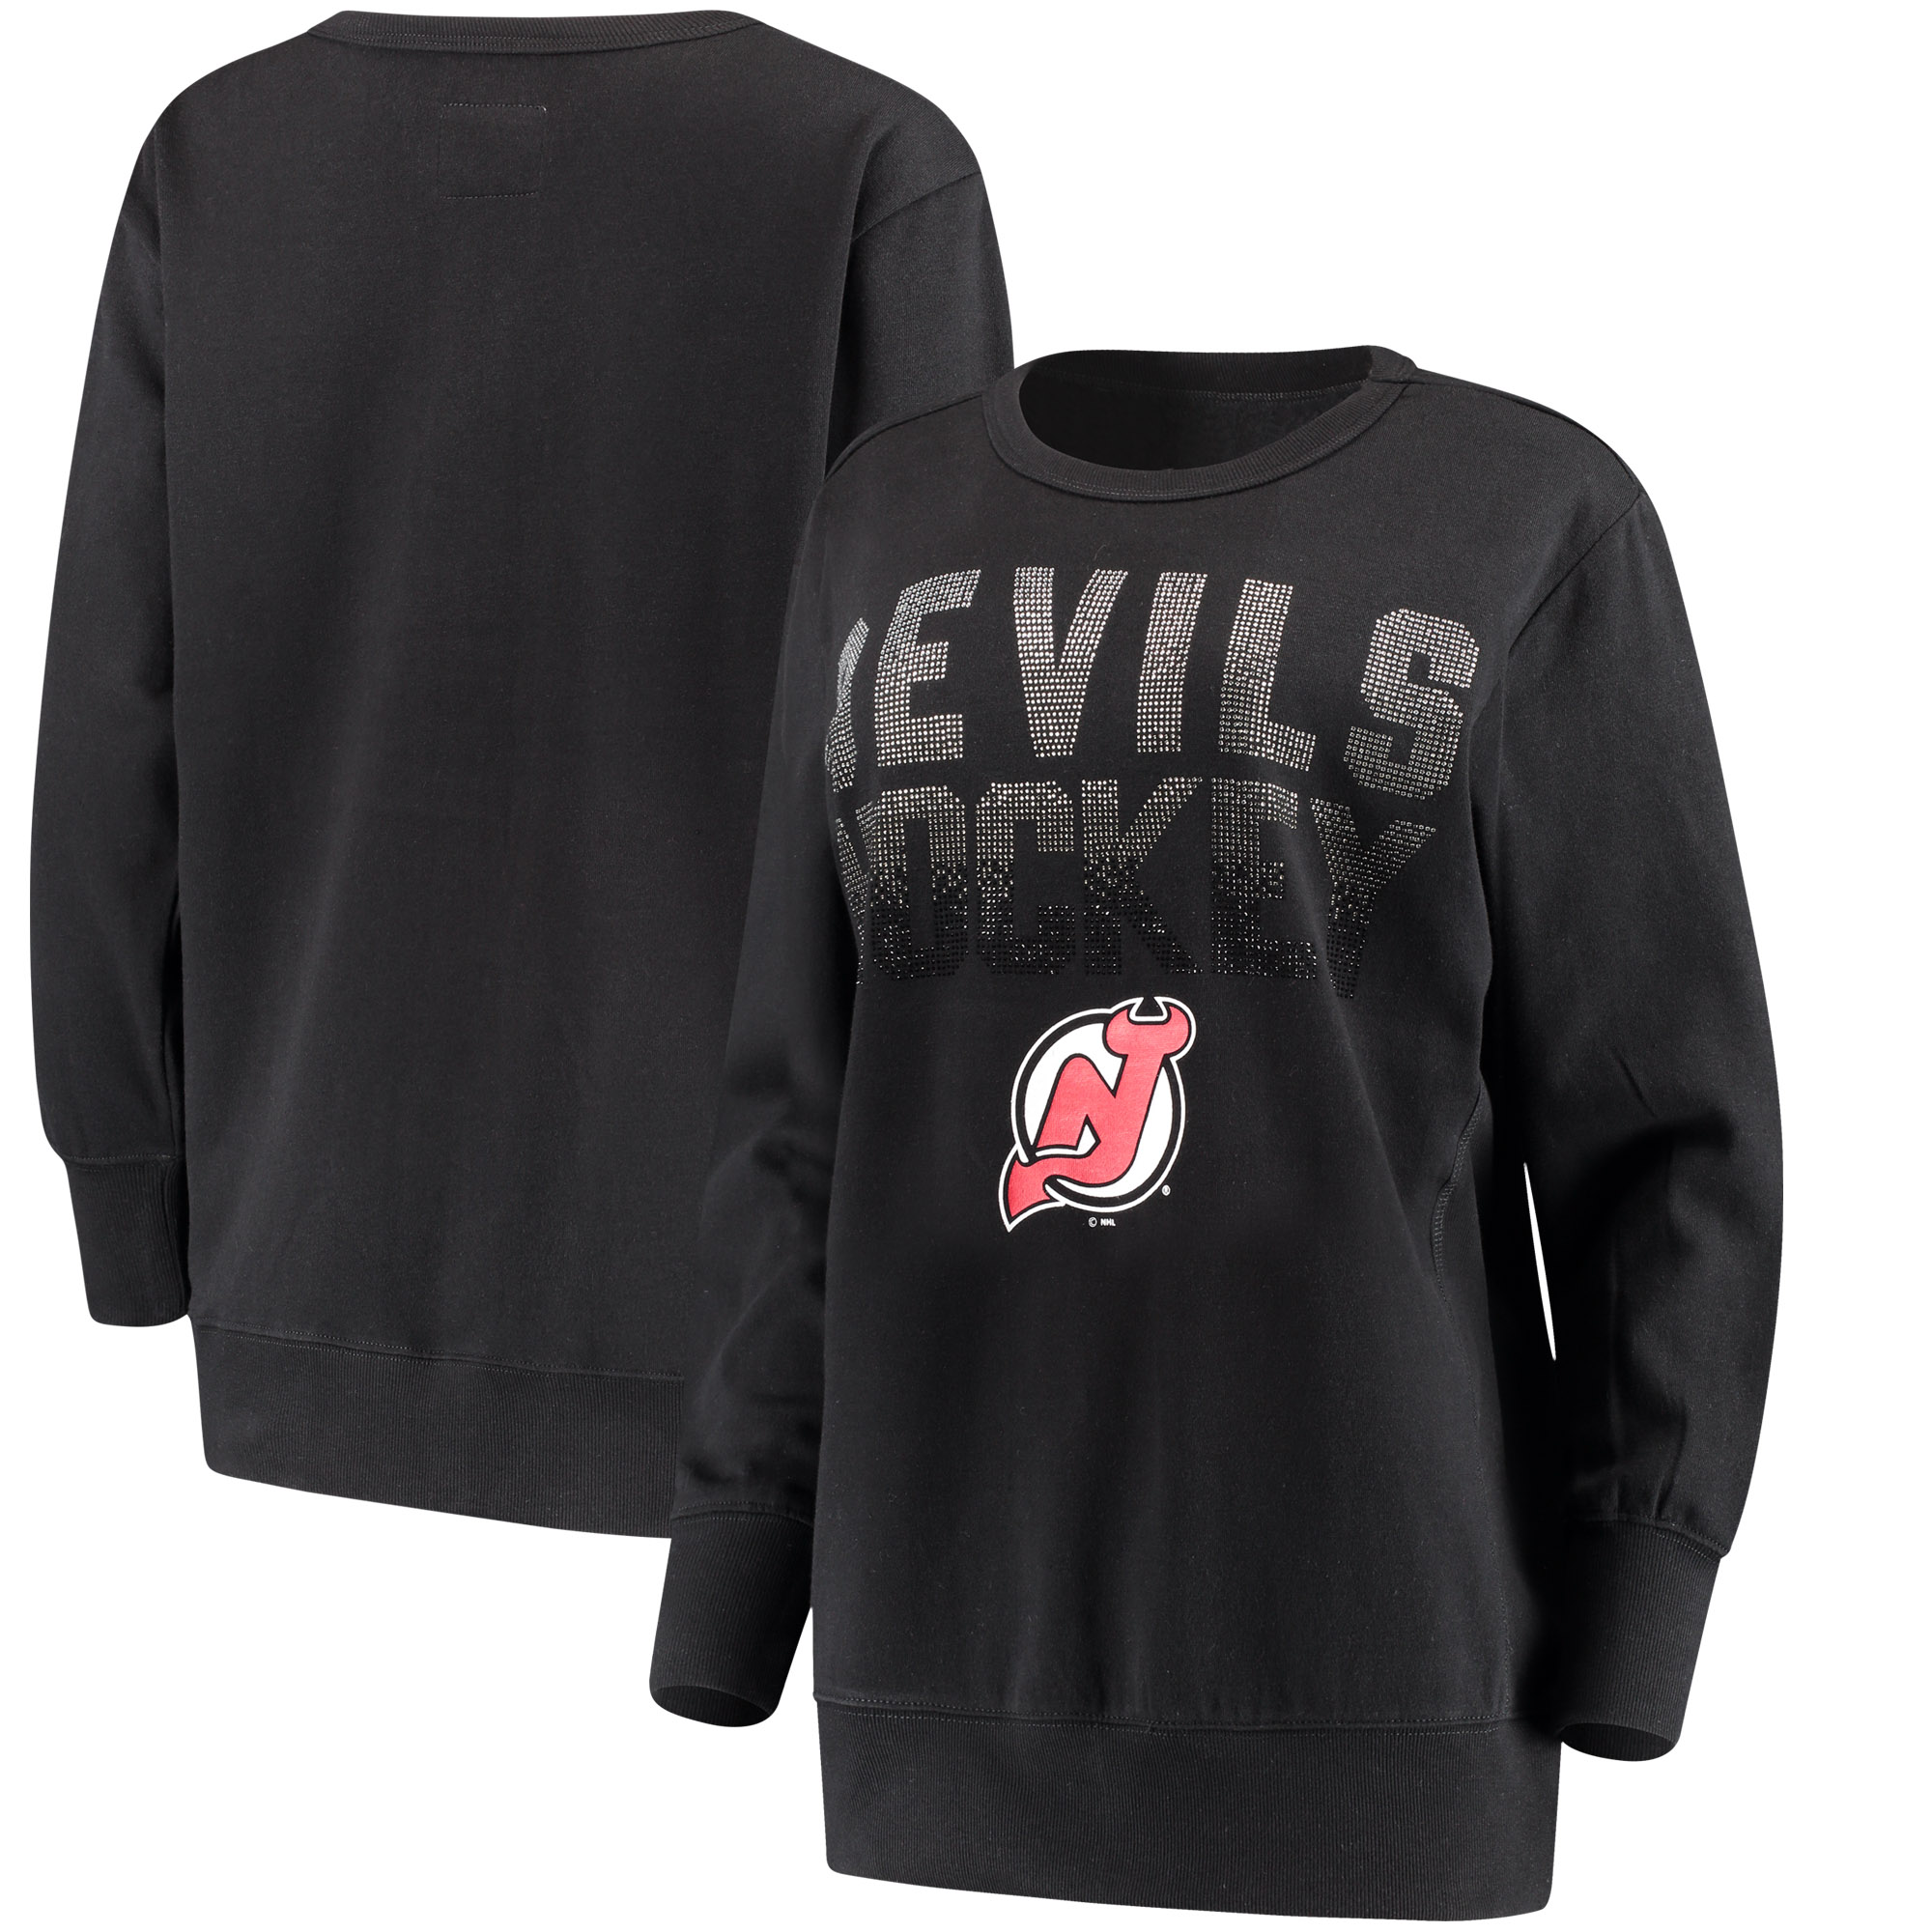 New Jersey Devils G-III 4Her by Carl Banks Women's Showtime Pullover Crewneck Sweatshirt - Black